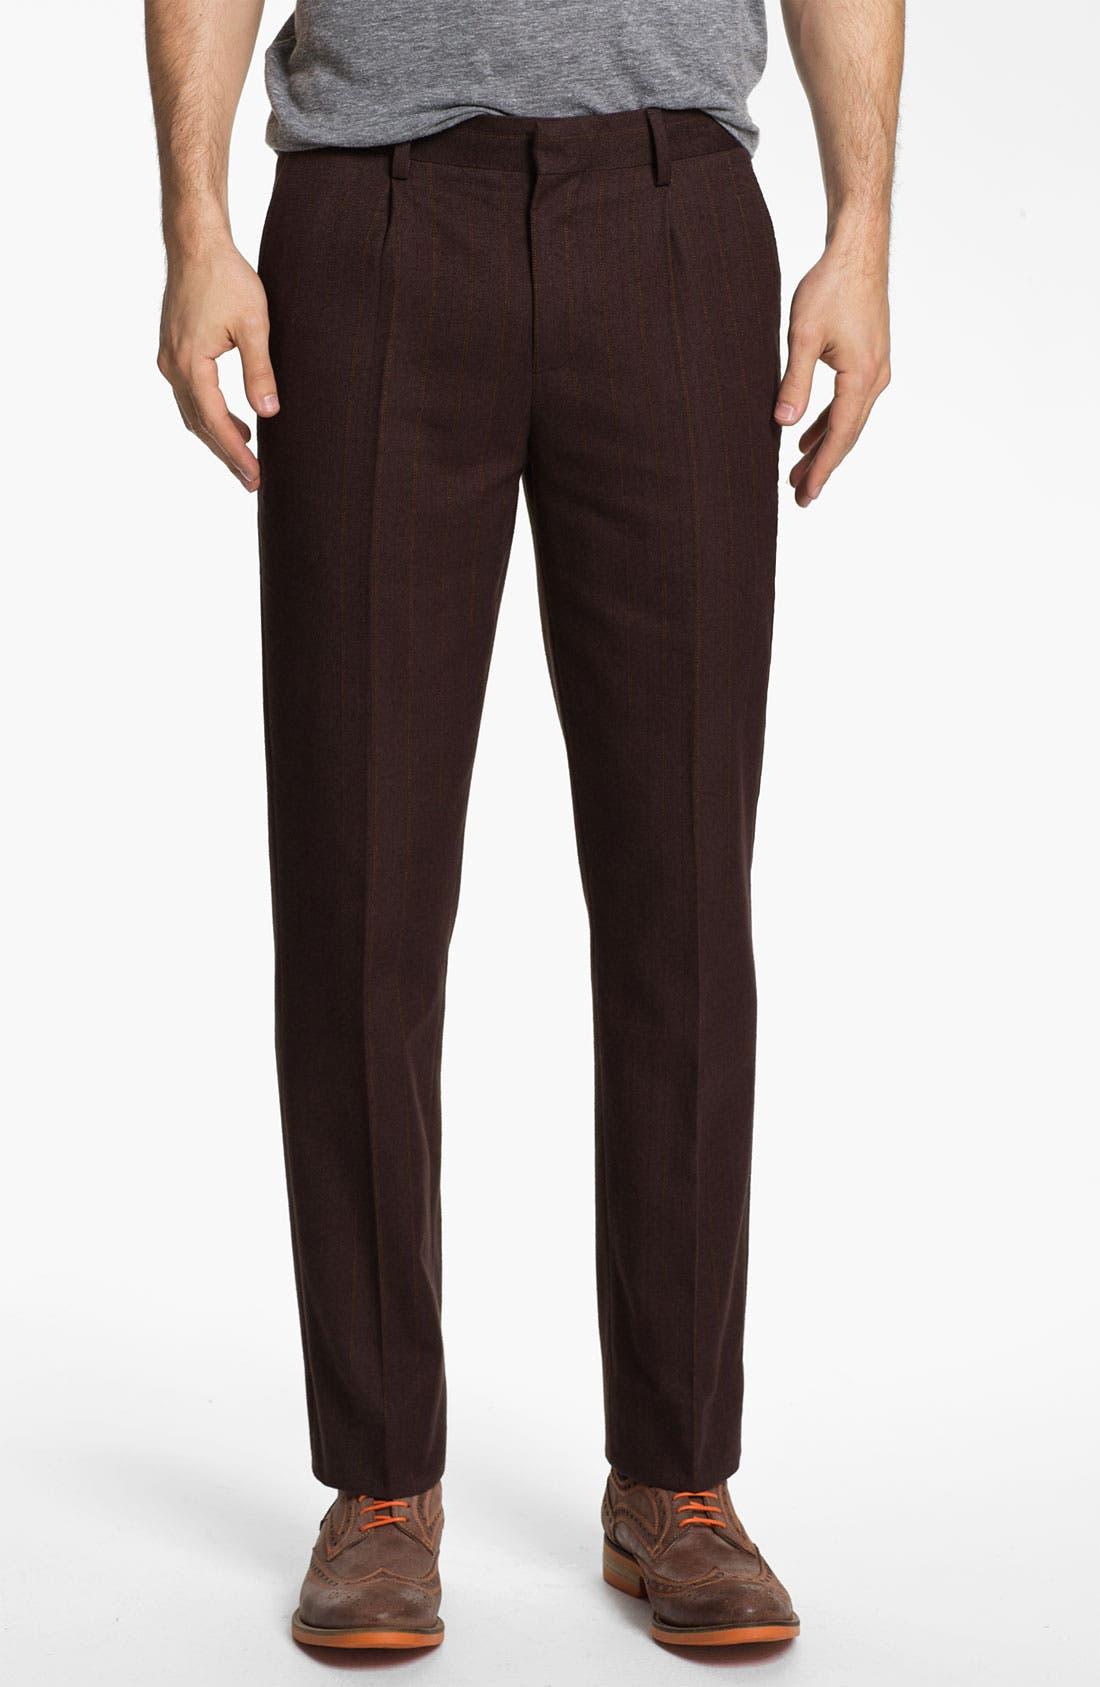 Main Image - 1901 Slim Pleated Trousers